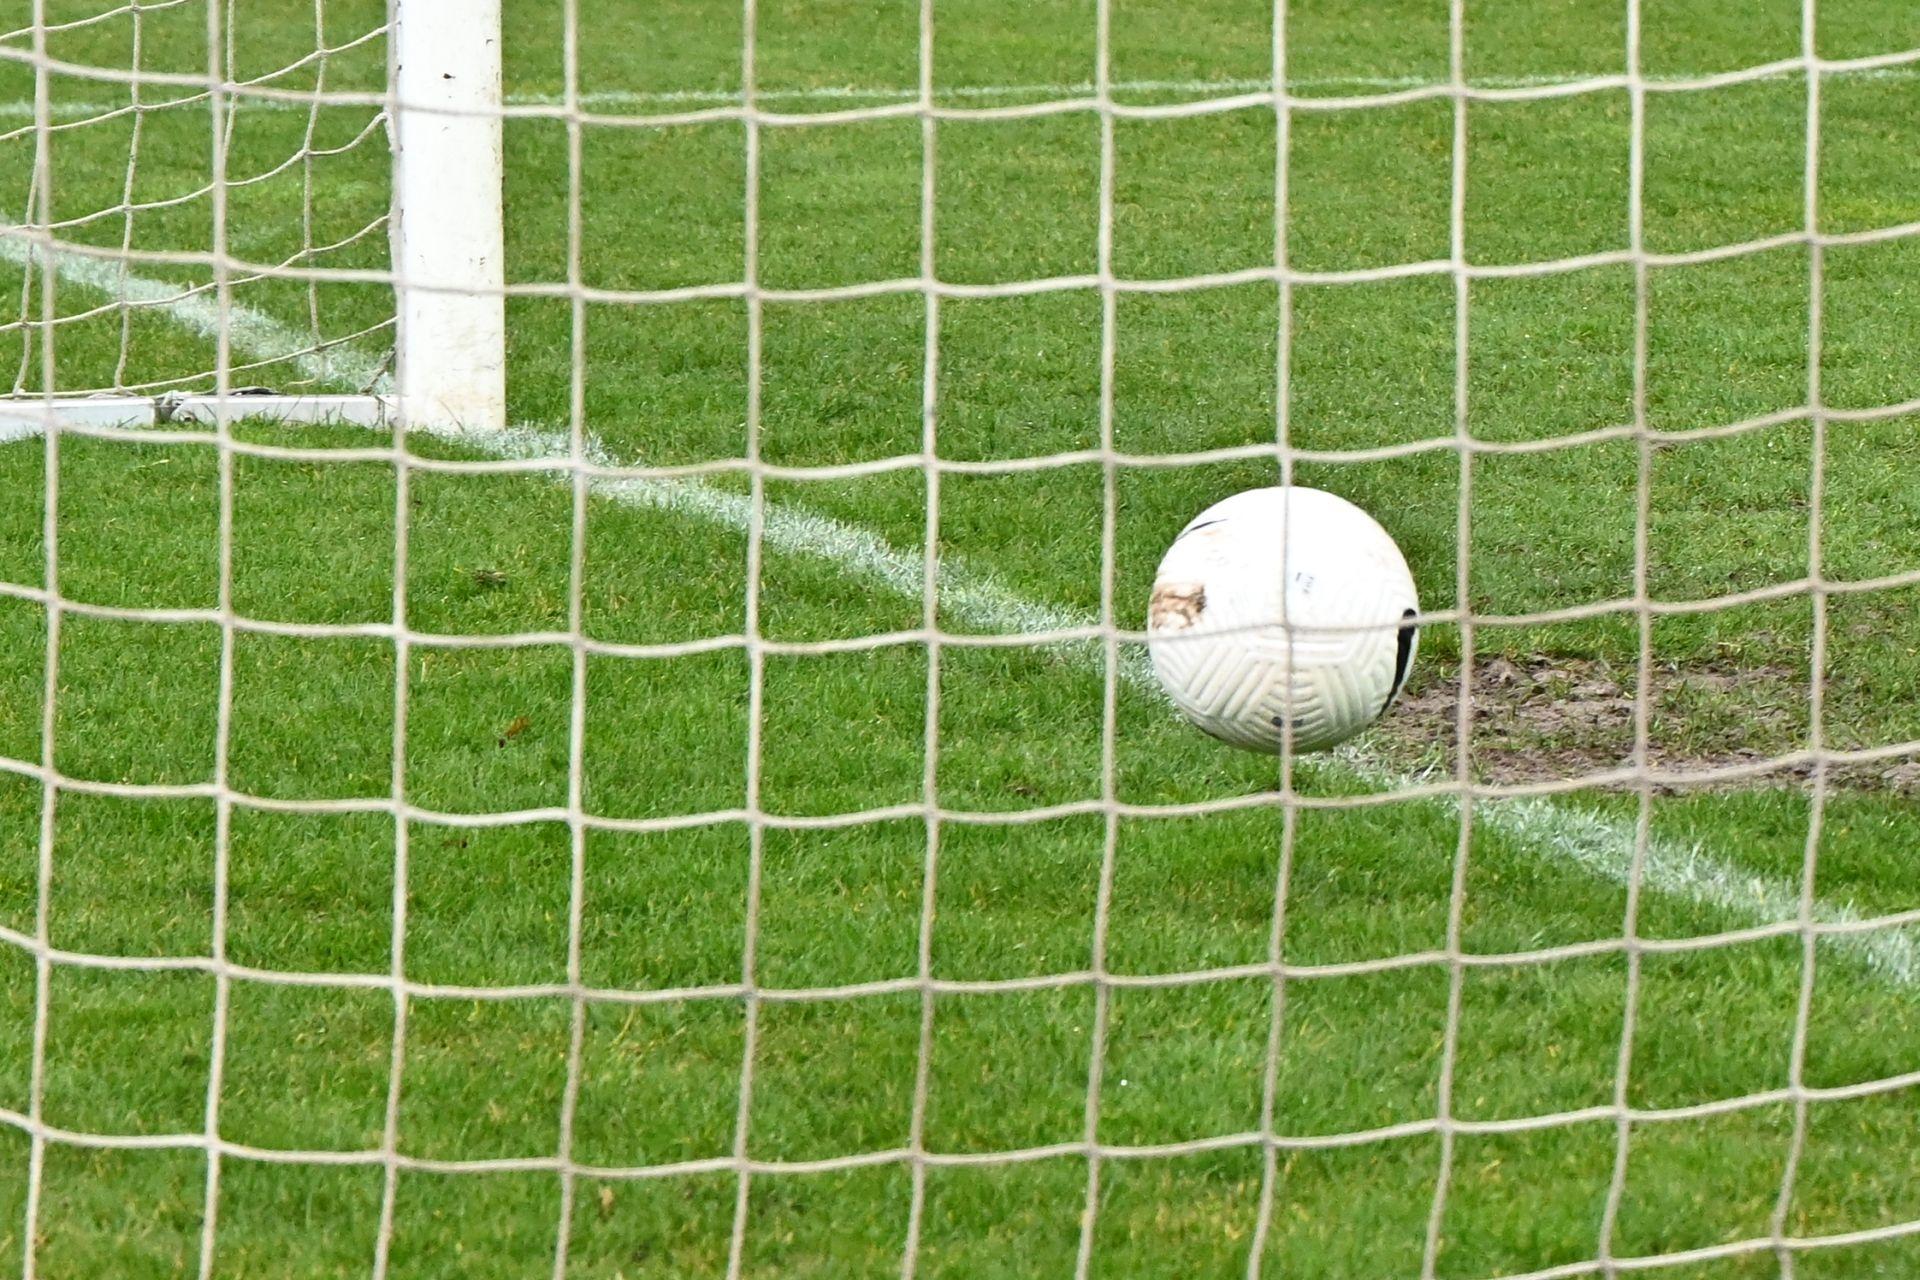 Regionalliga Südwest 2020/21, KSV Hessen Kassel, FSV Frankfurt, Endstand 2:1, Tor zum 2:0